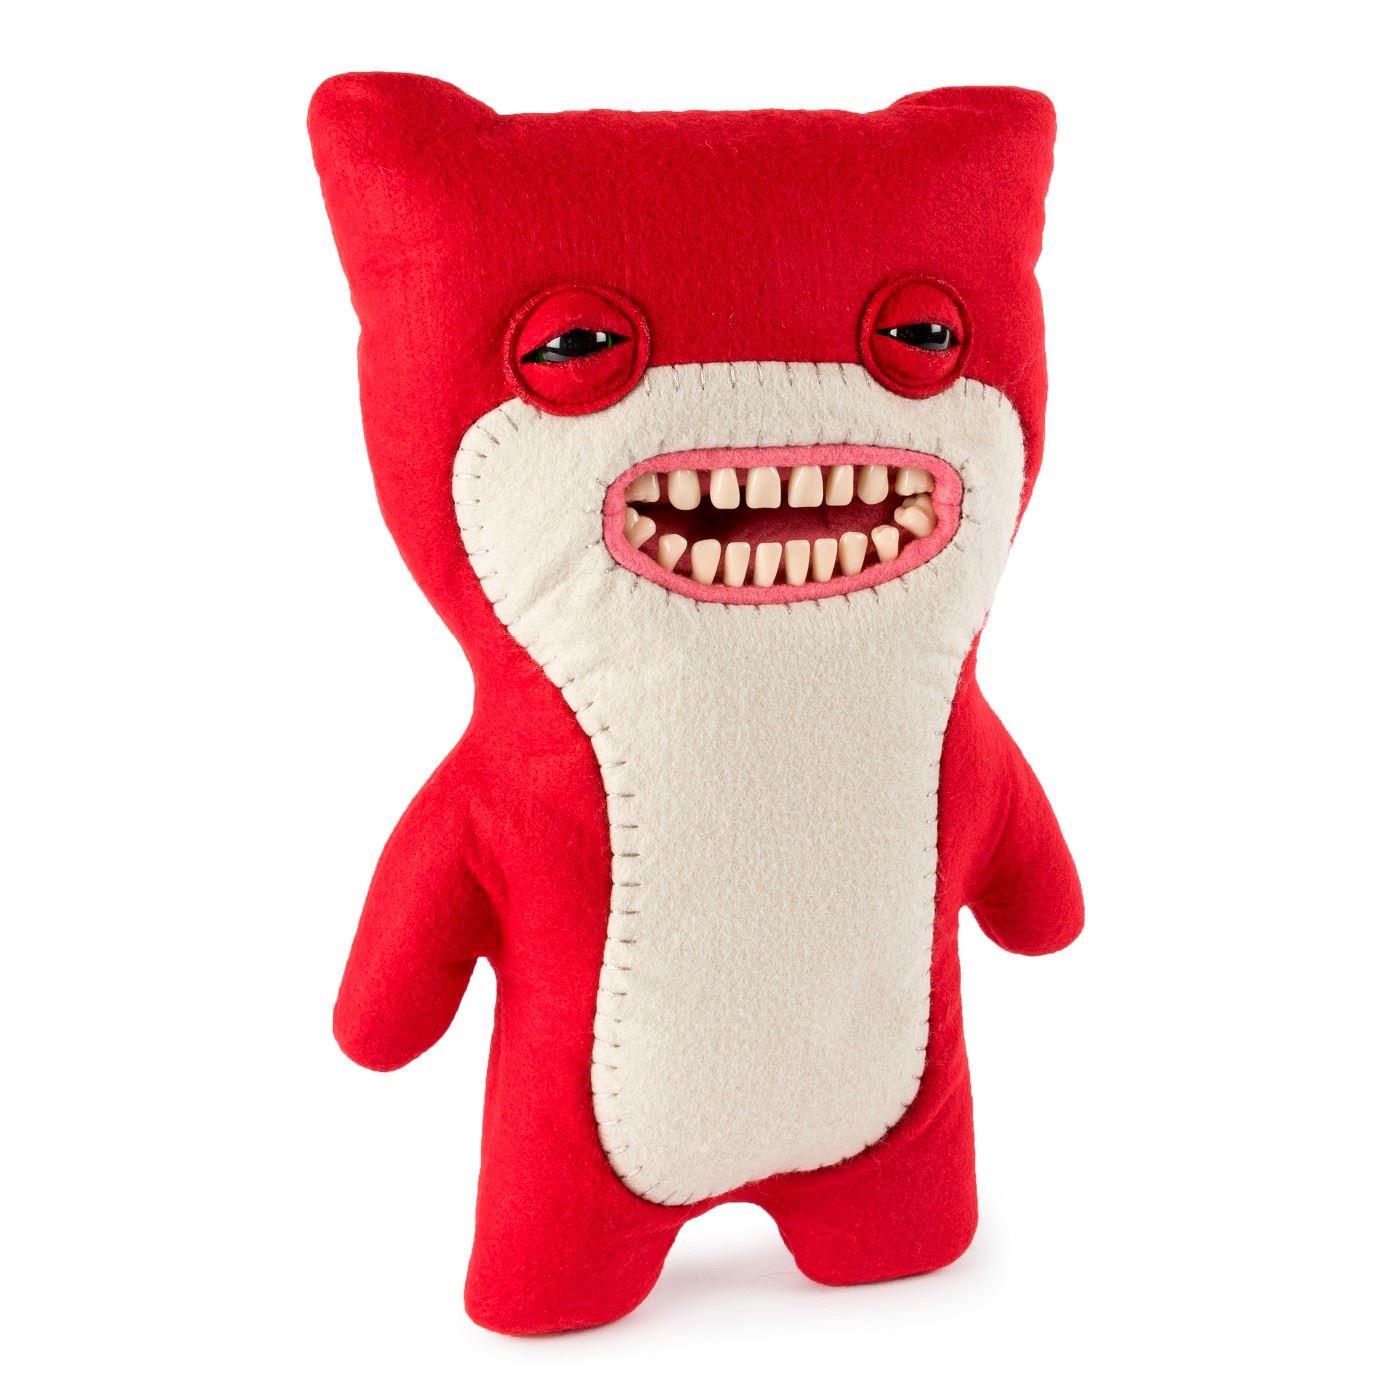 Fuggler-Funny-Uggly-Monsters-Blue-Red-Purple-Light-Red-Stuffed-Animal 縮圖 7